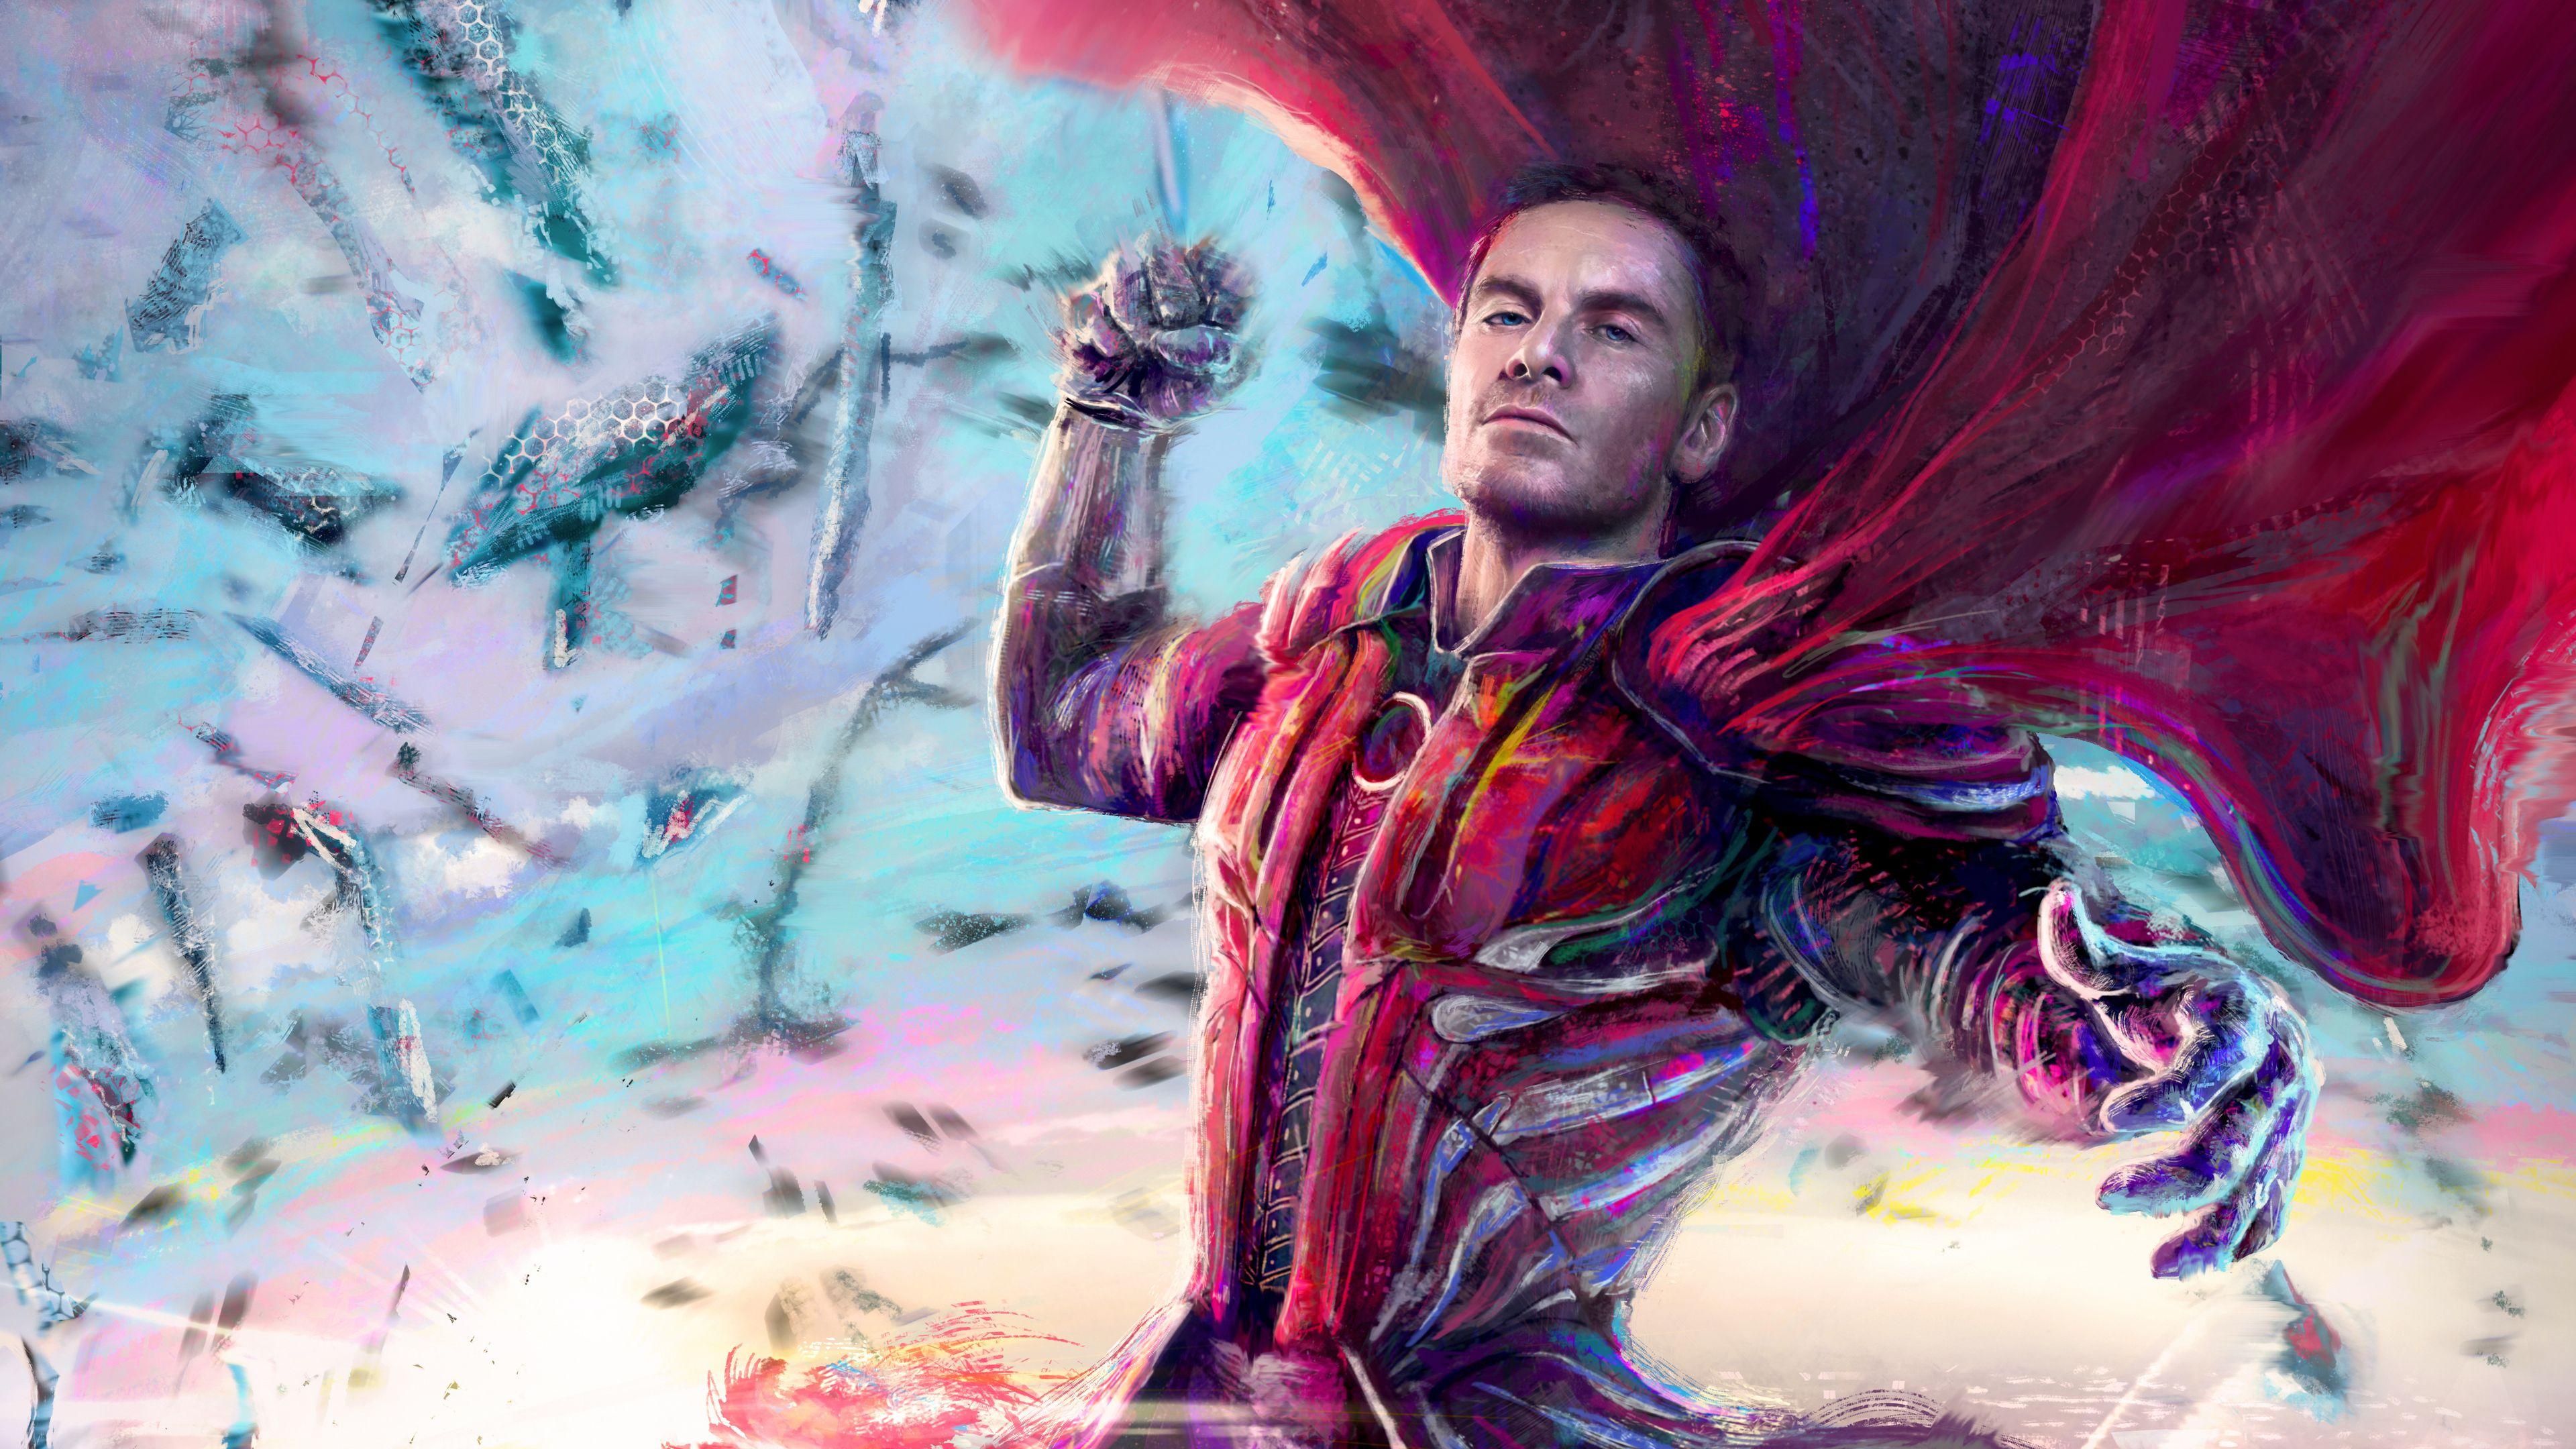 Magneto Artwork 5k x men wallpapers superheroes wallpapers hd 3840x2160